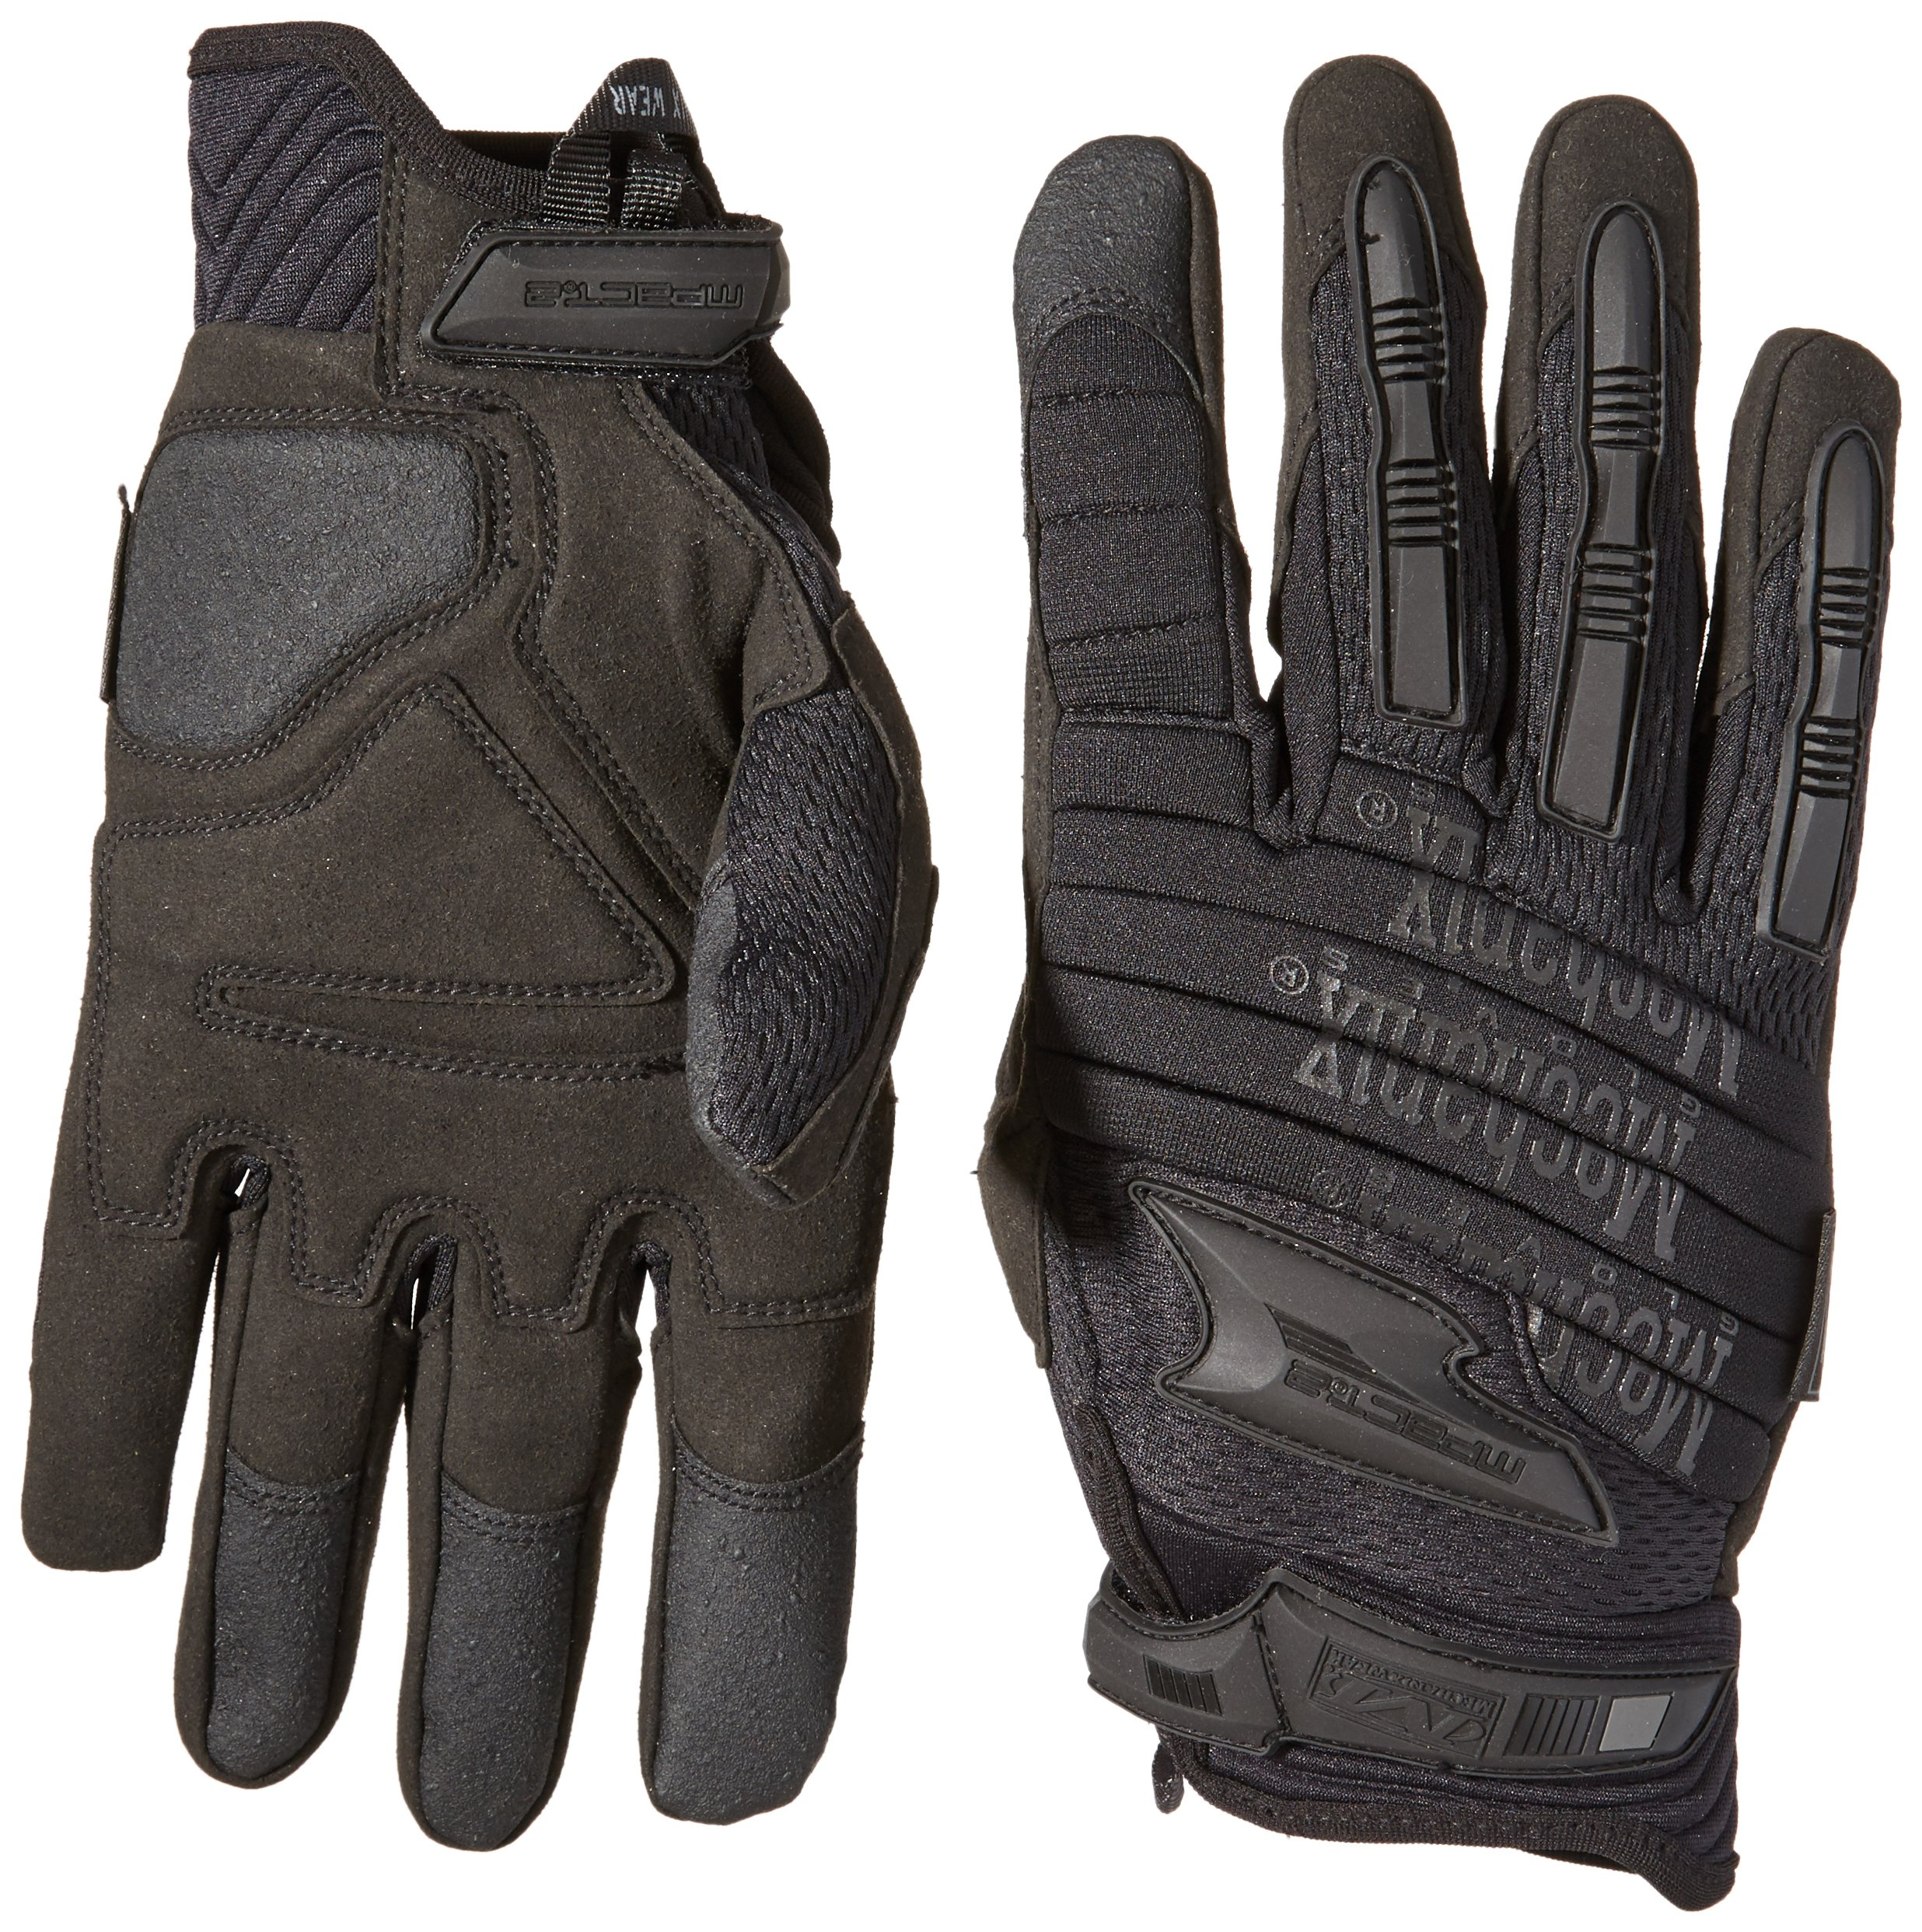 Mechanix Wear MP2-F55-011 TAA Compliant M-Pact 2 Glove, X-Large, Black